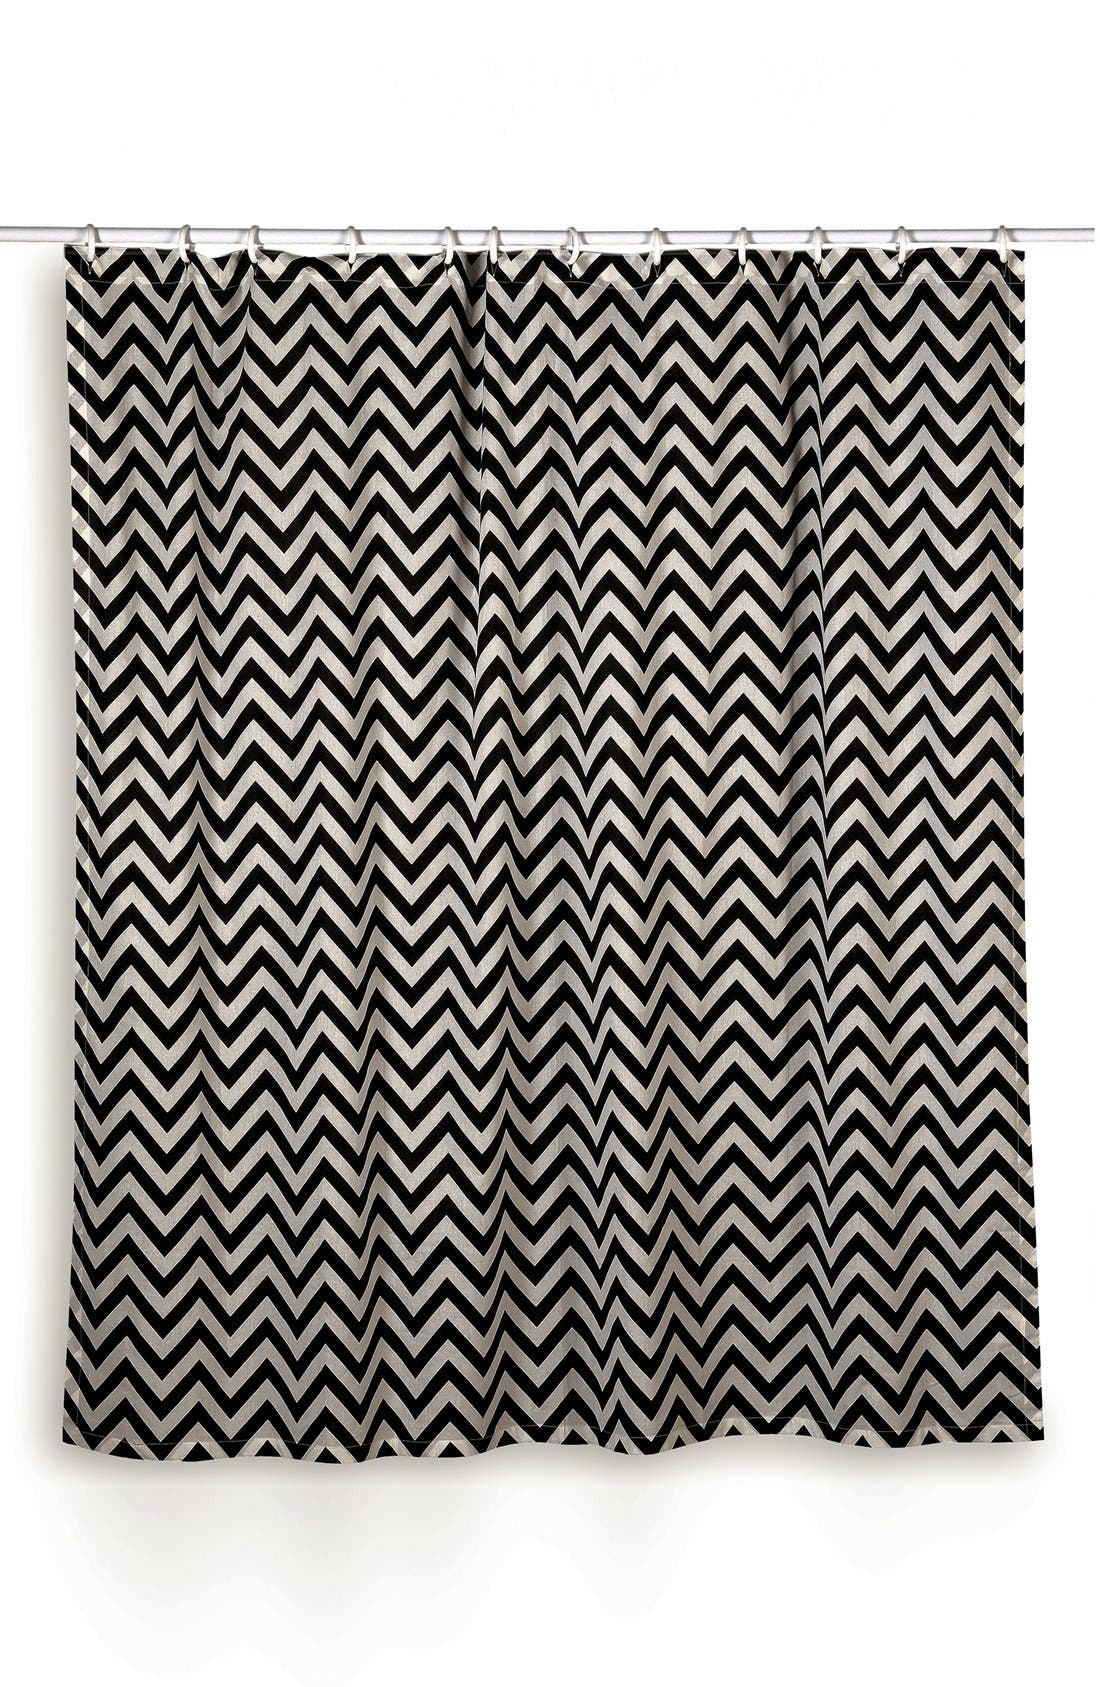 Main Image - Rizzy Home Chevron Shower Curtain